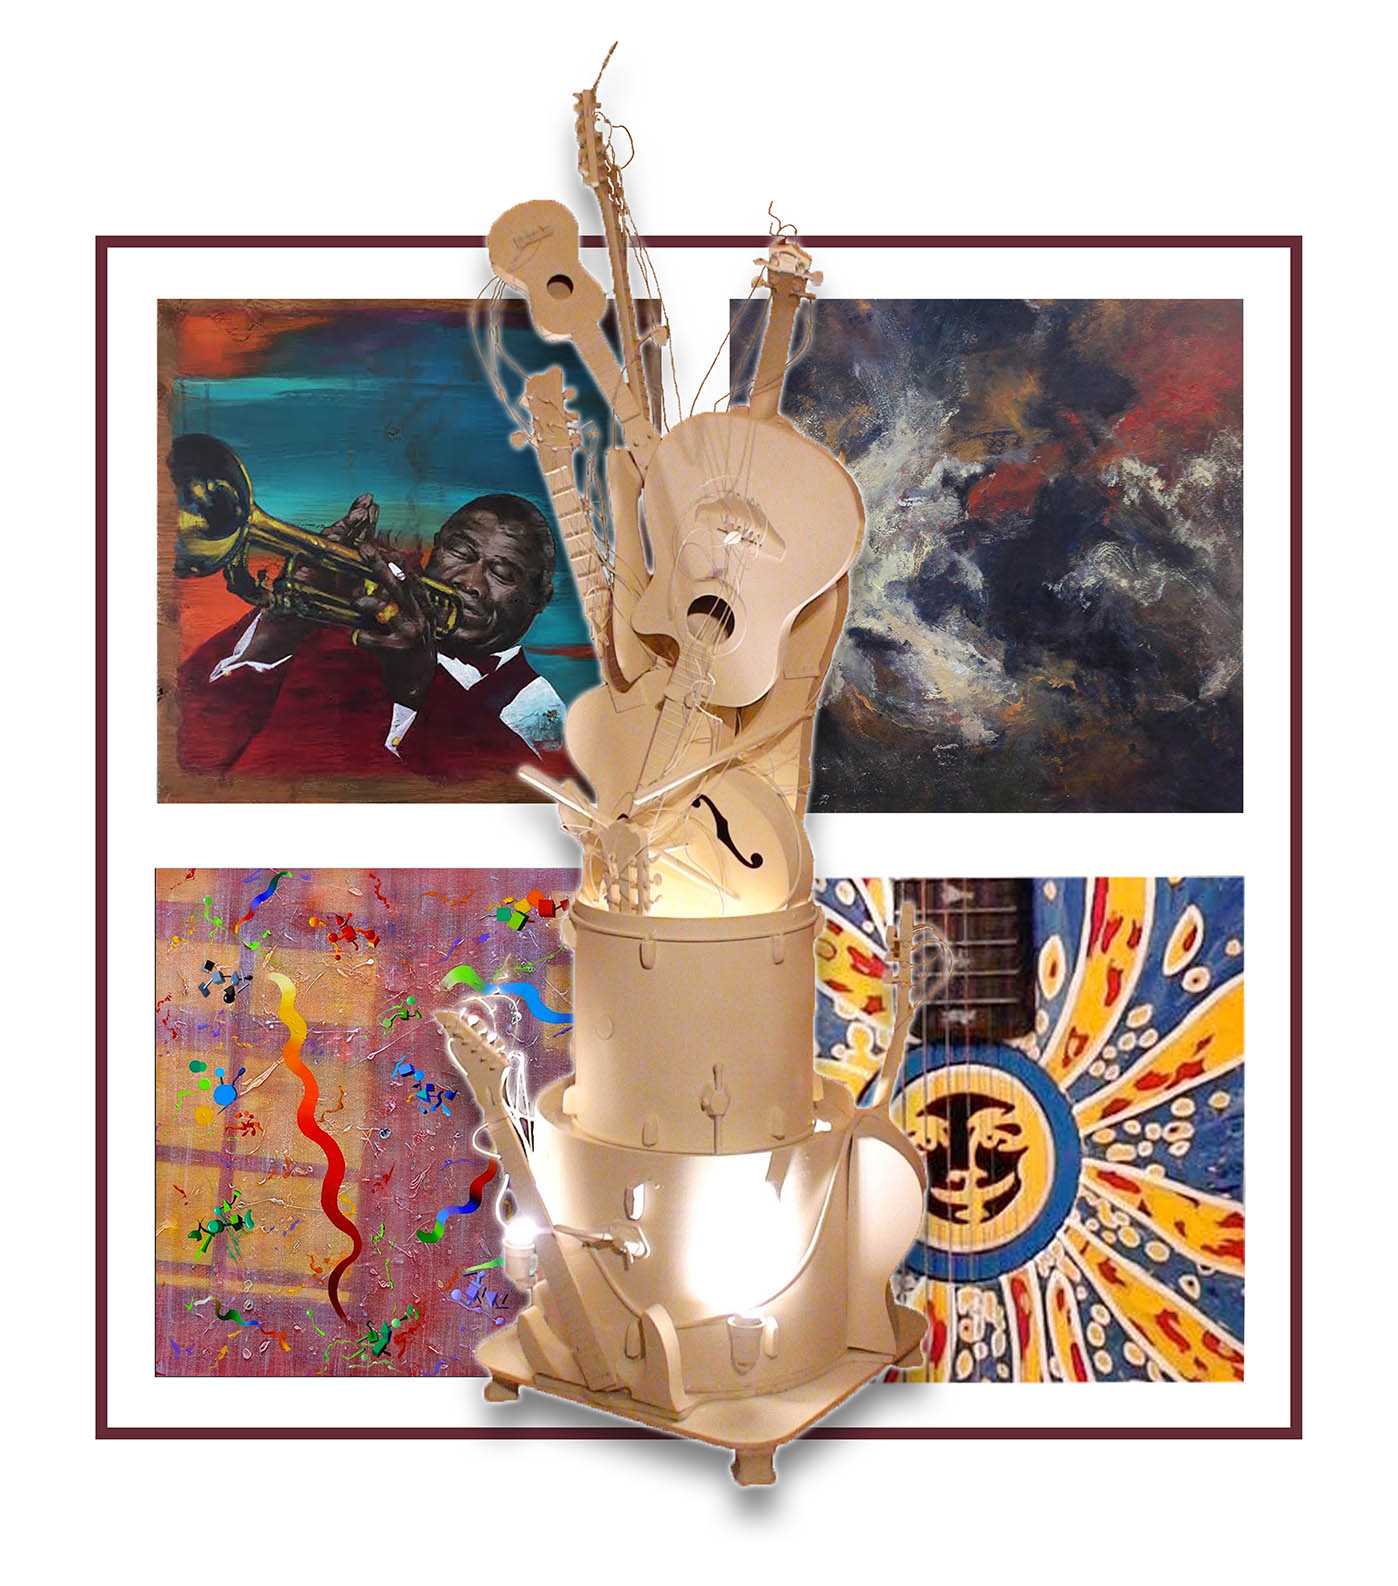 Good Vibrations: A Harmony of Art & Music at Very Ventura.